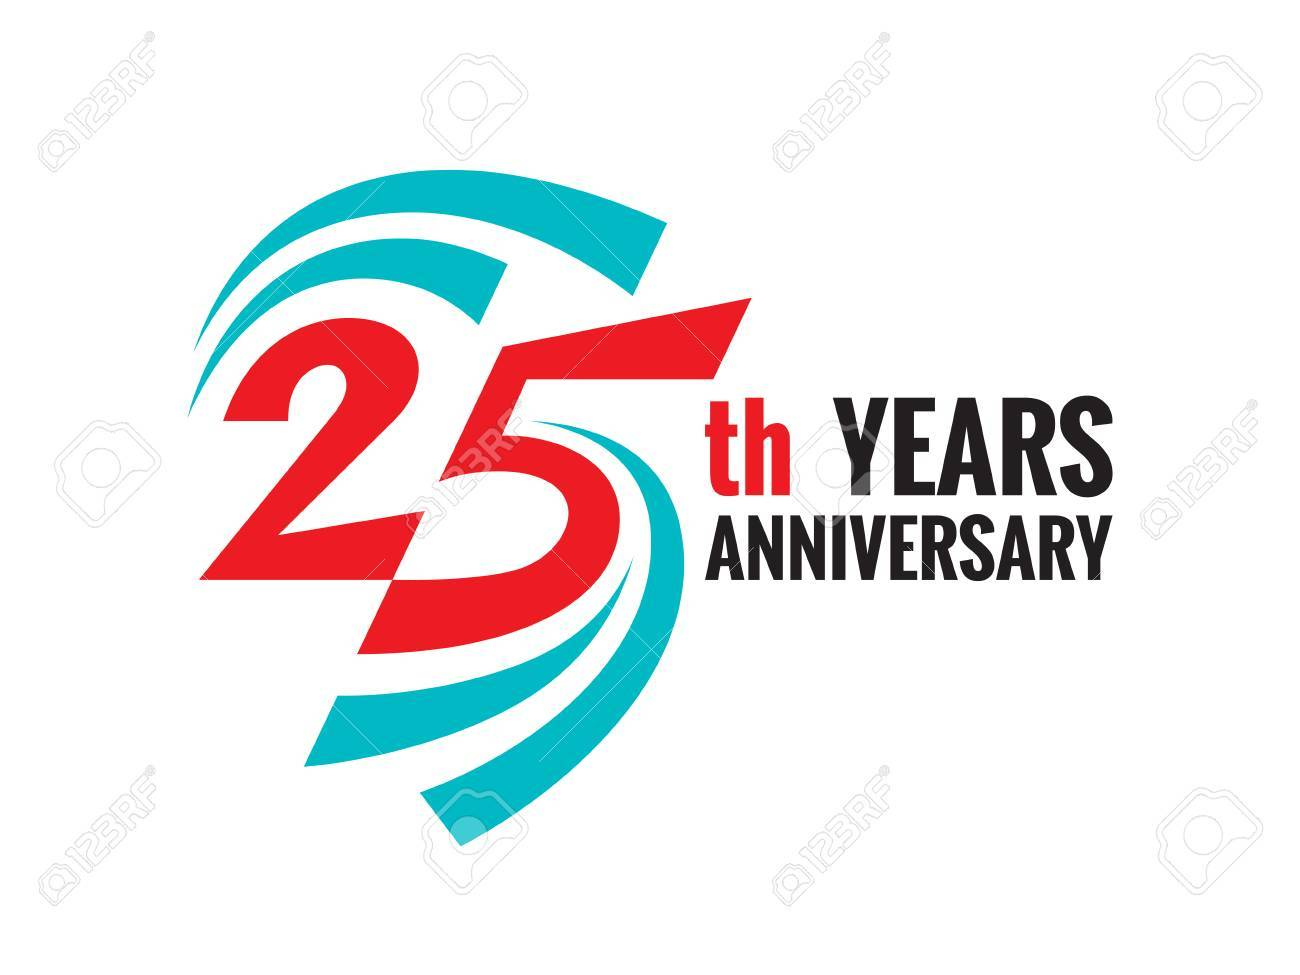 creative emblem 25 th years anniversary twenty five template rh 123rf com 25 years logo hd 25 years logo hd